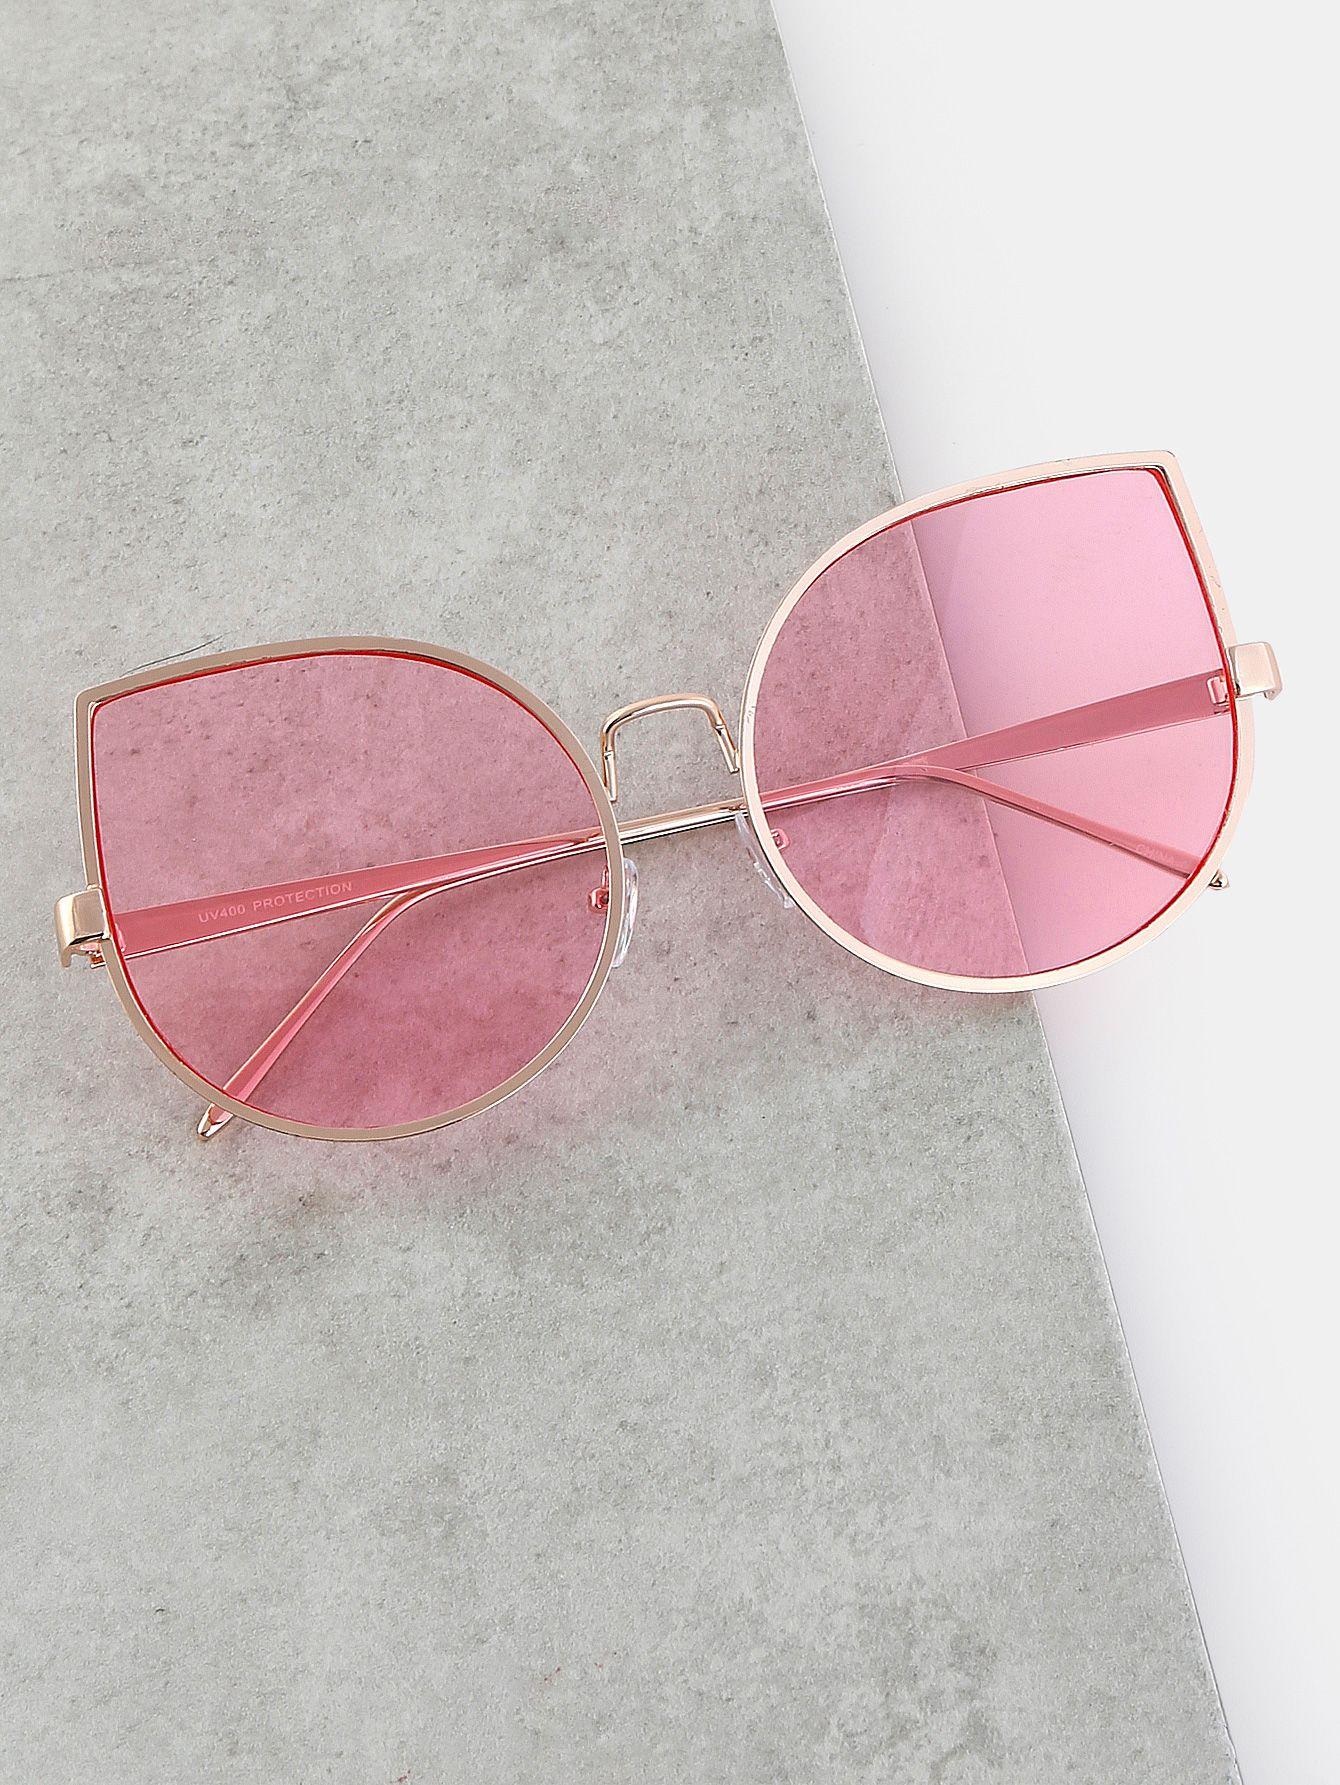 92afc554286e4 Oversized Retro Inspired Sunglasses PINK